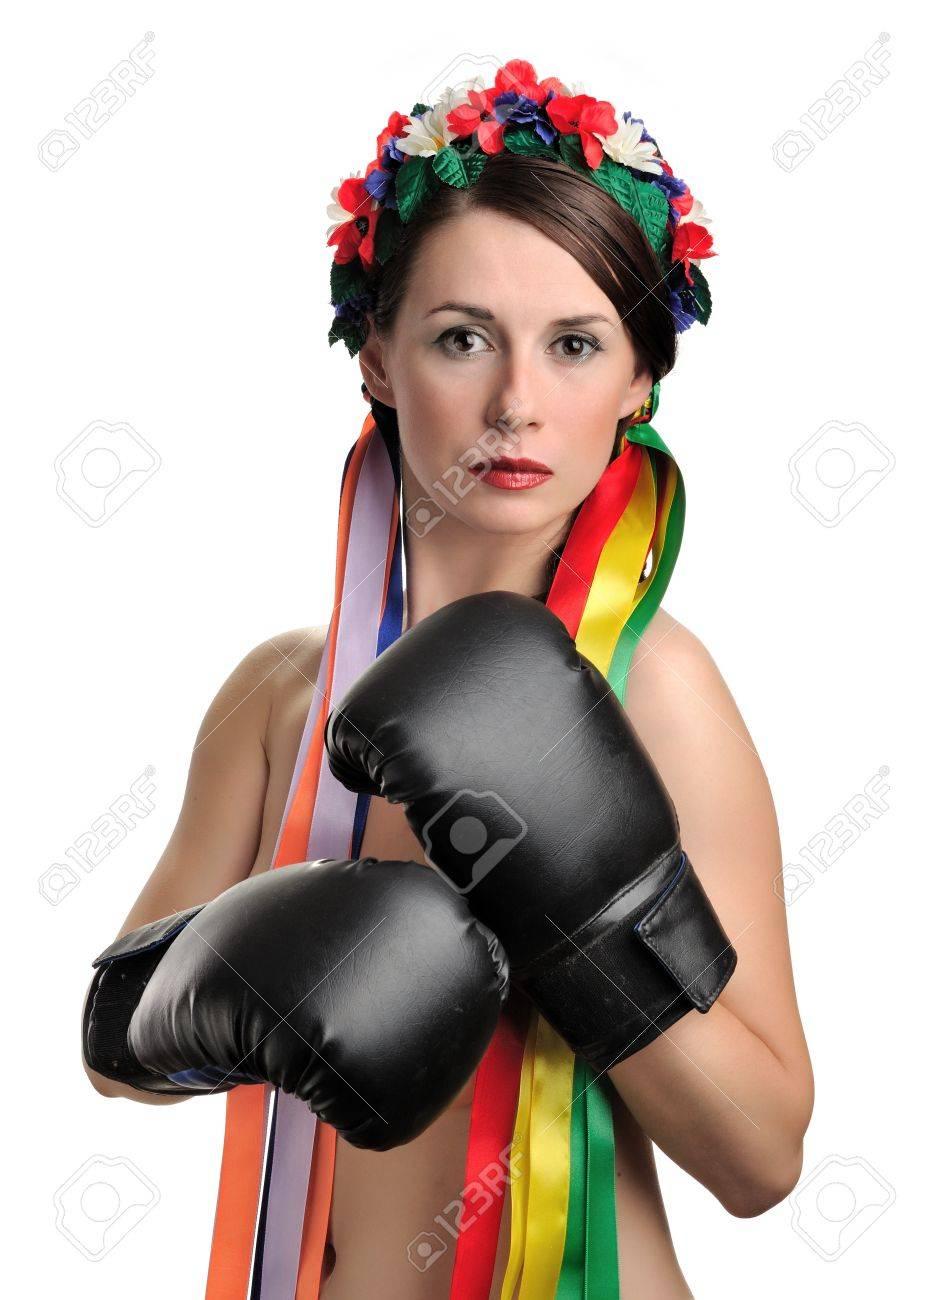 girls-topless-boxing-girl-pics-video